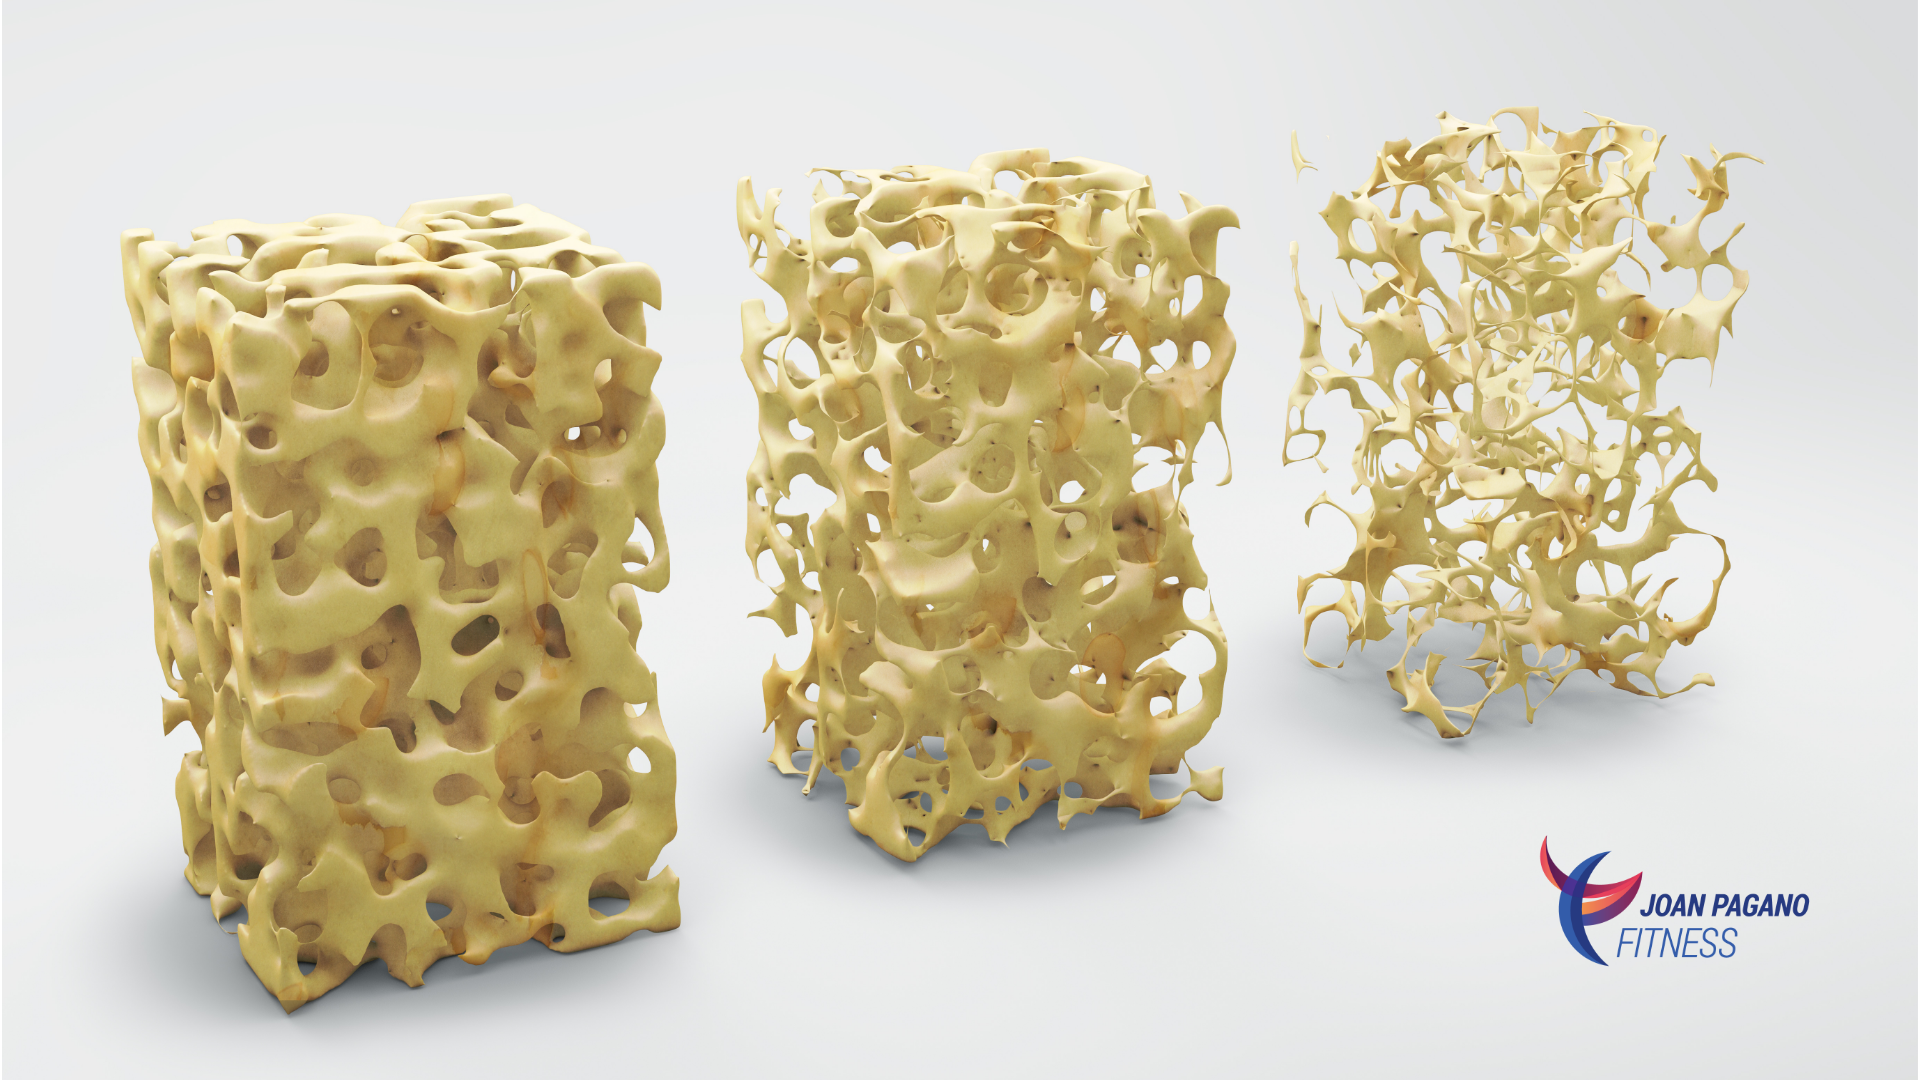 Degrees of bone density: normal, osteopenia, osteoporosis